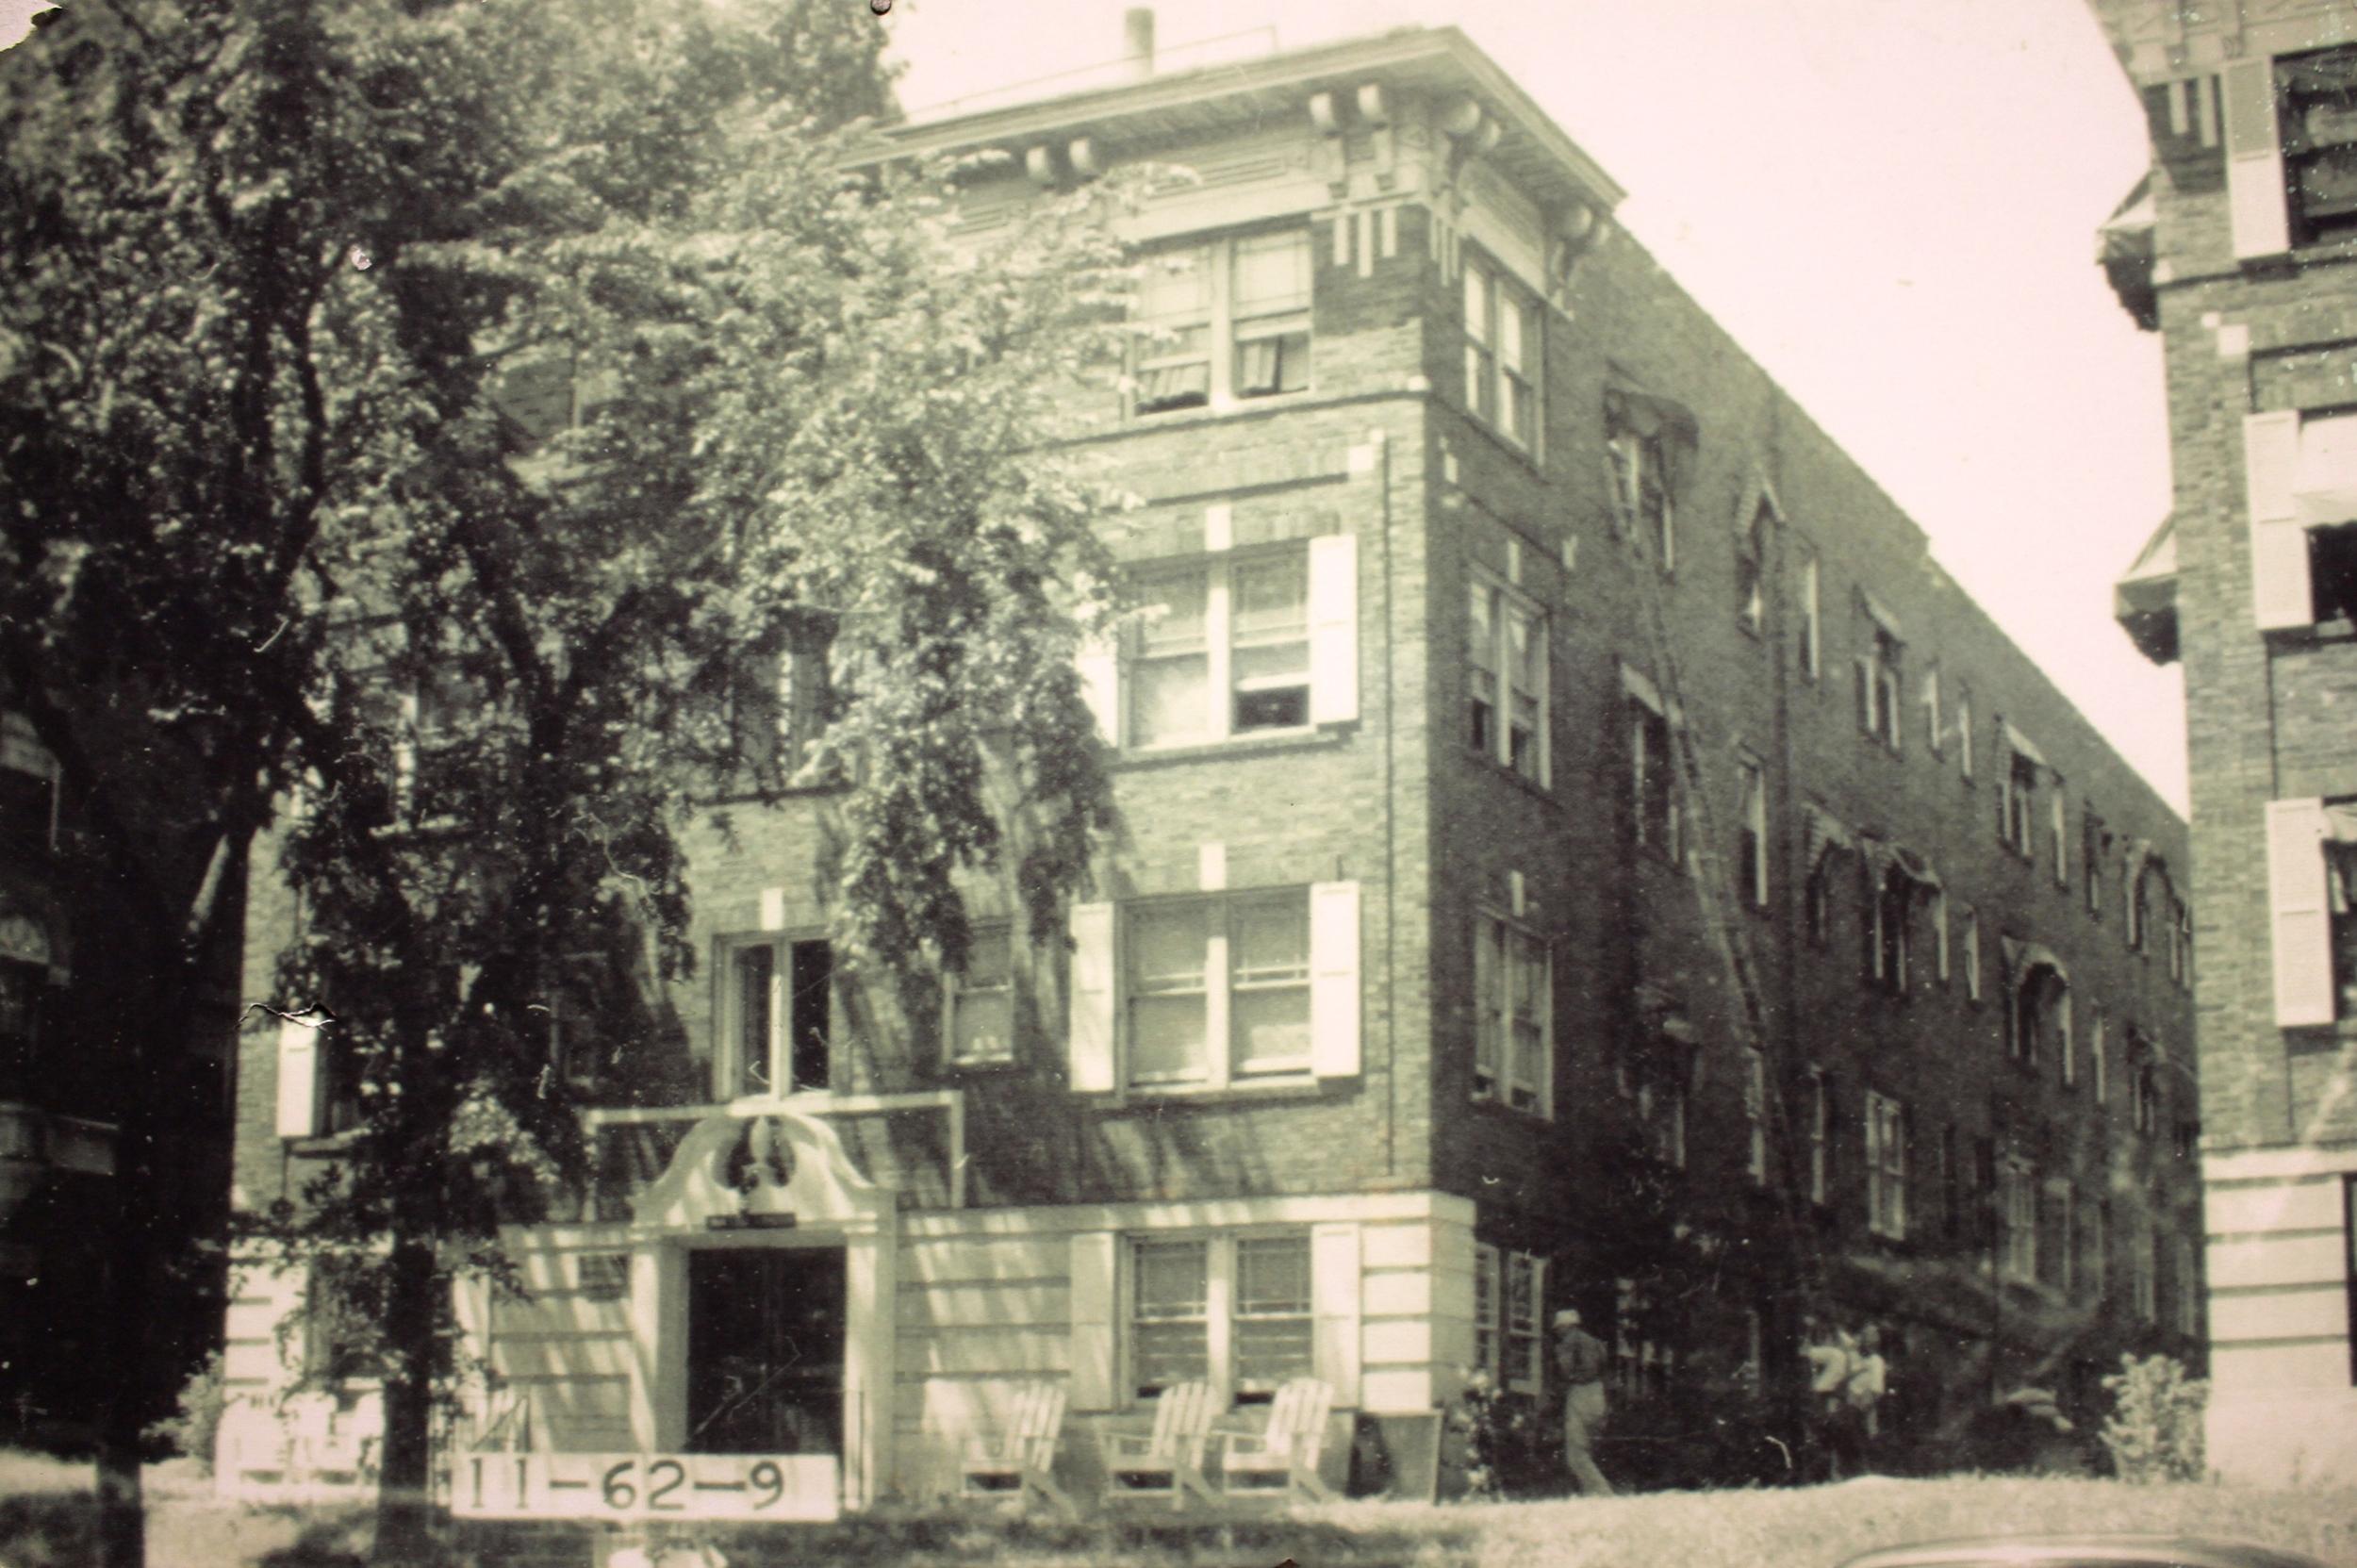 The Historic Ellison